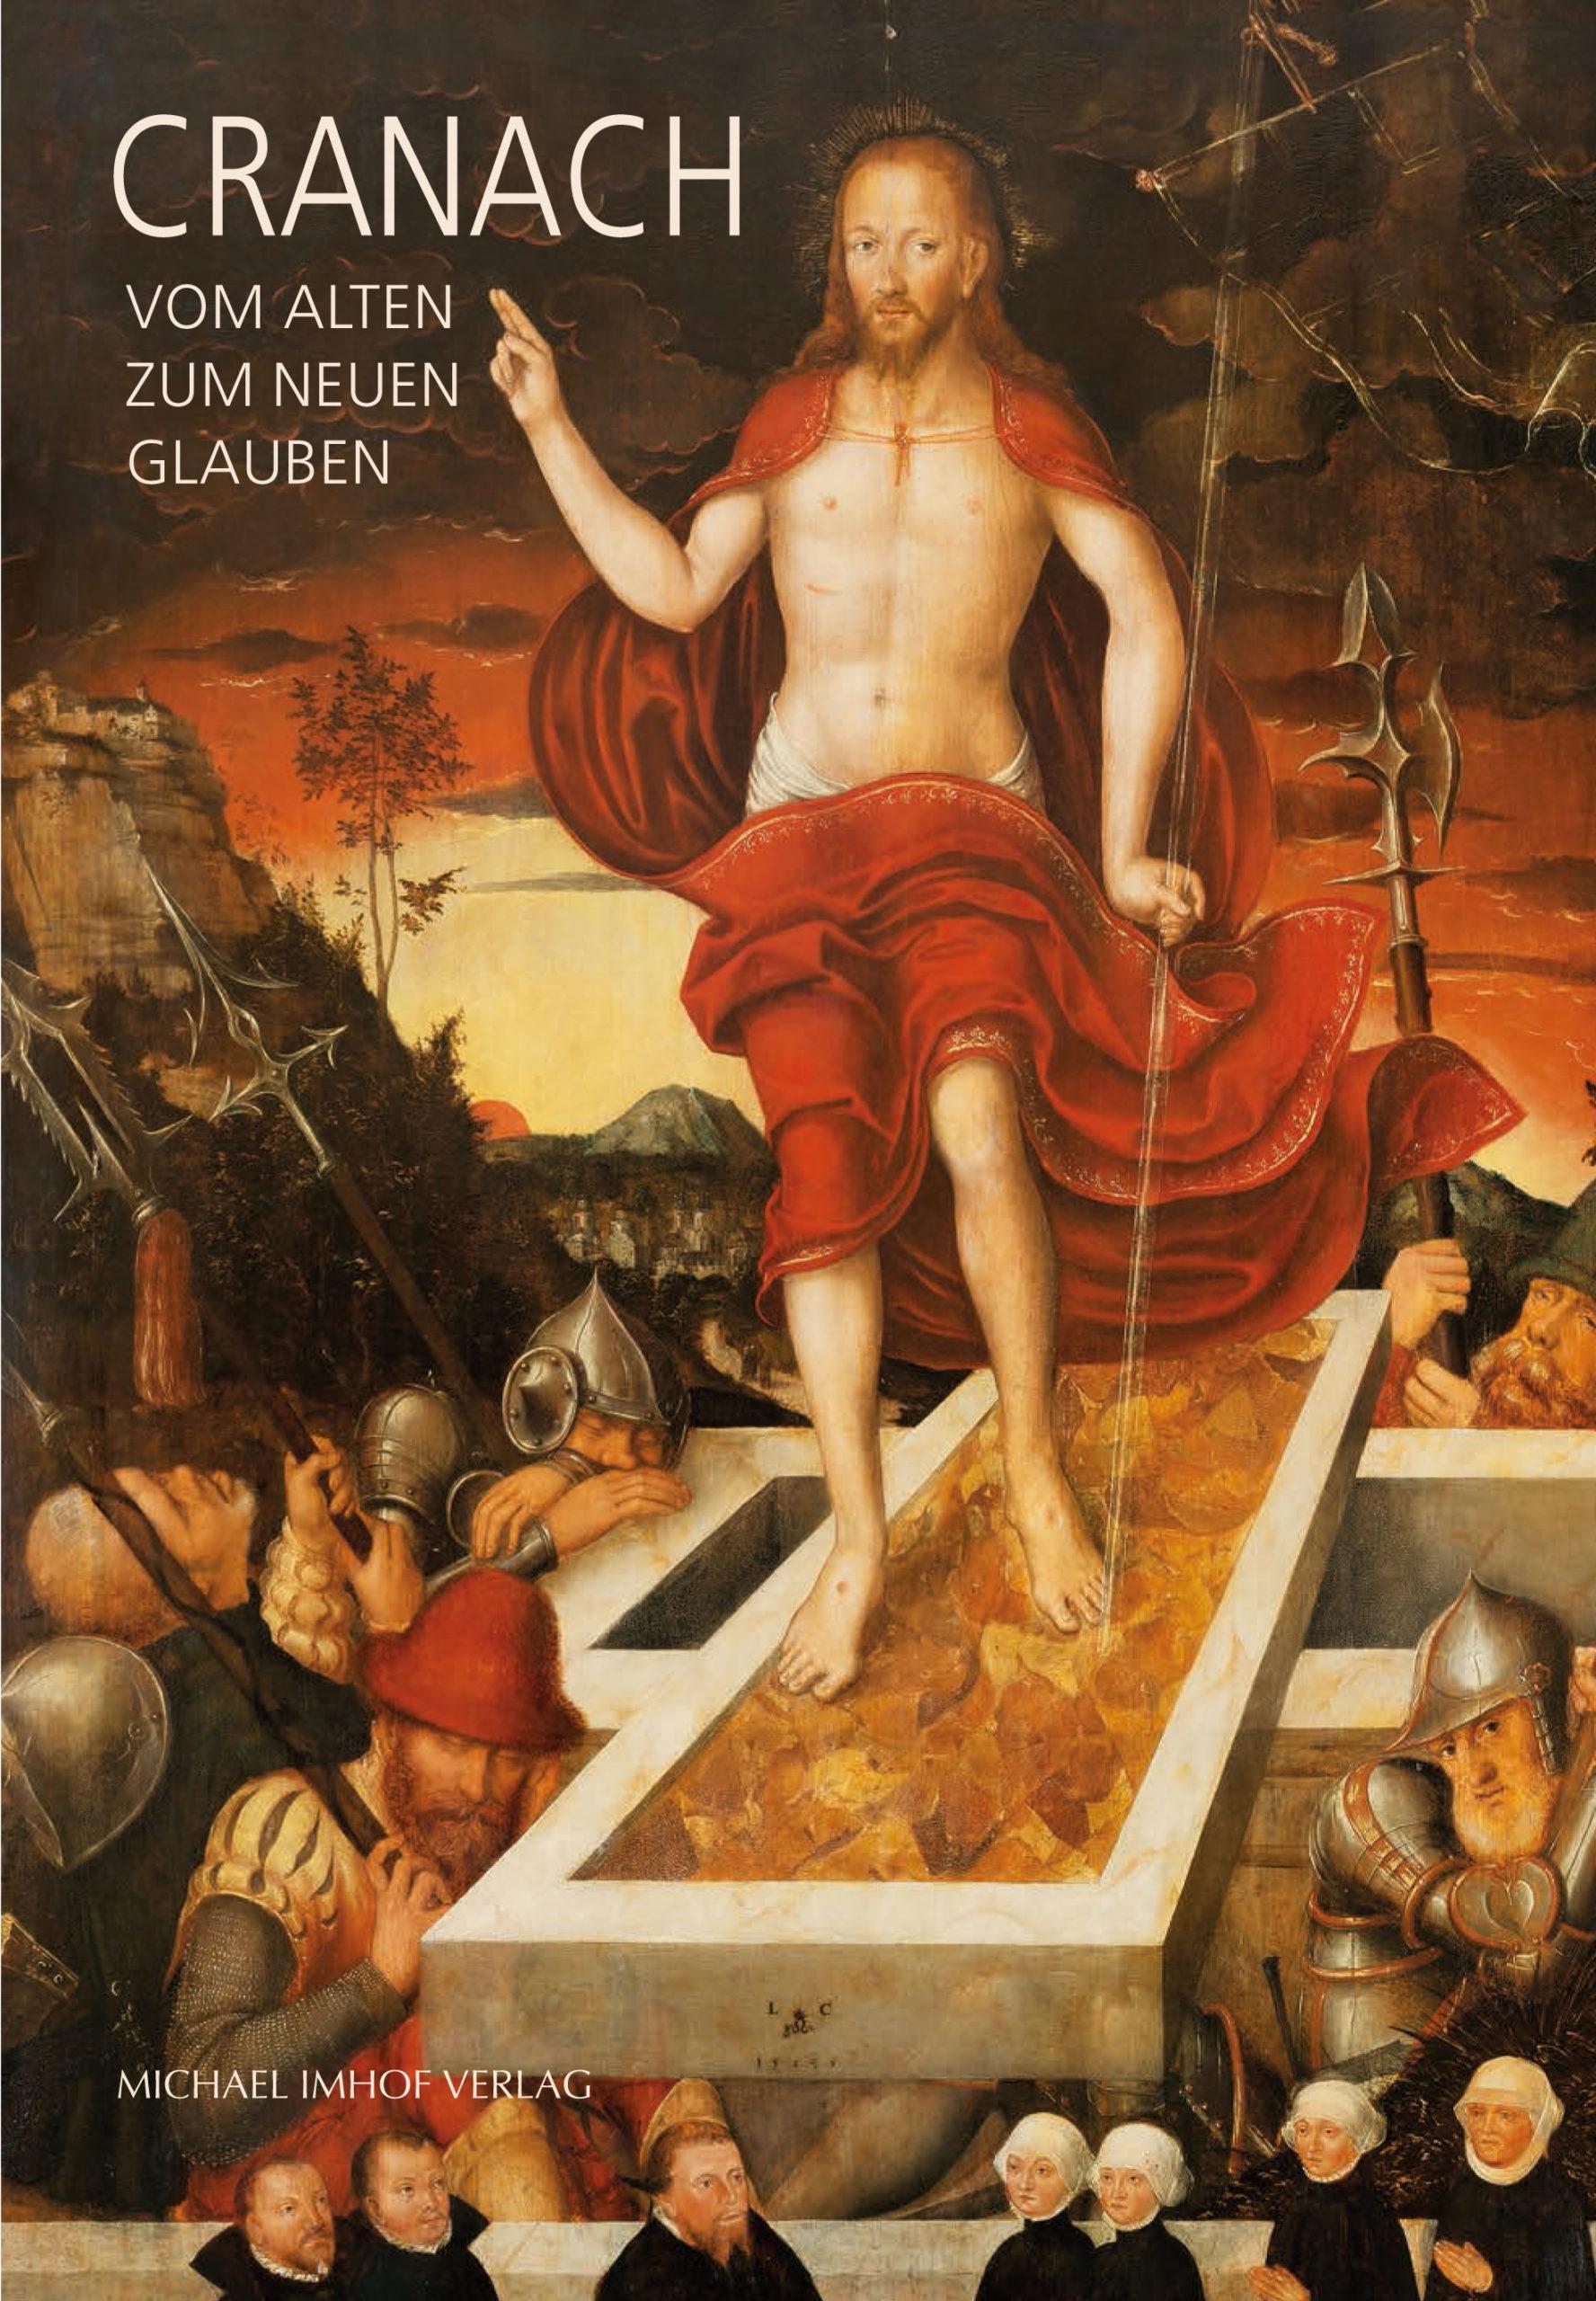 Cranach-Kurzfu hrer EF.qxt_St. Goar-F¸hrer